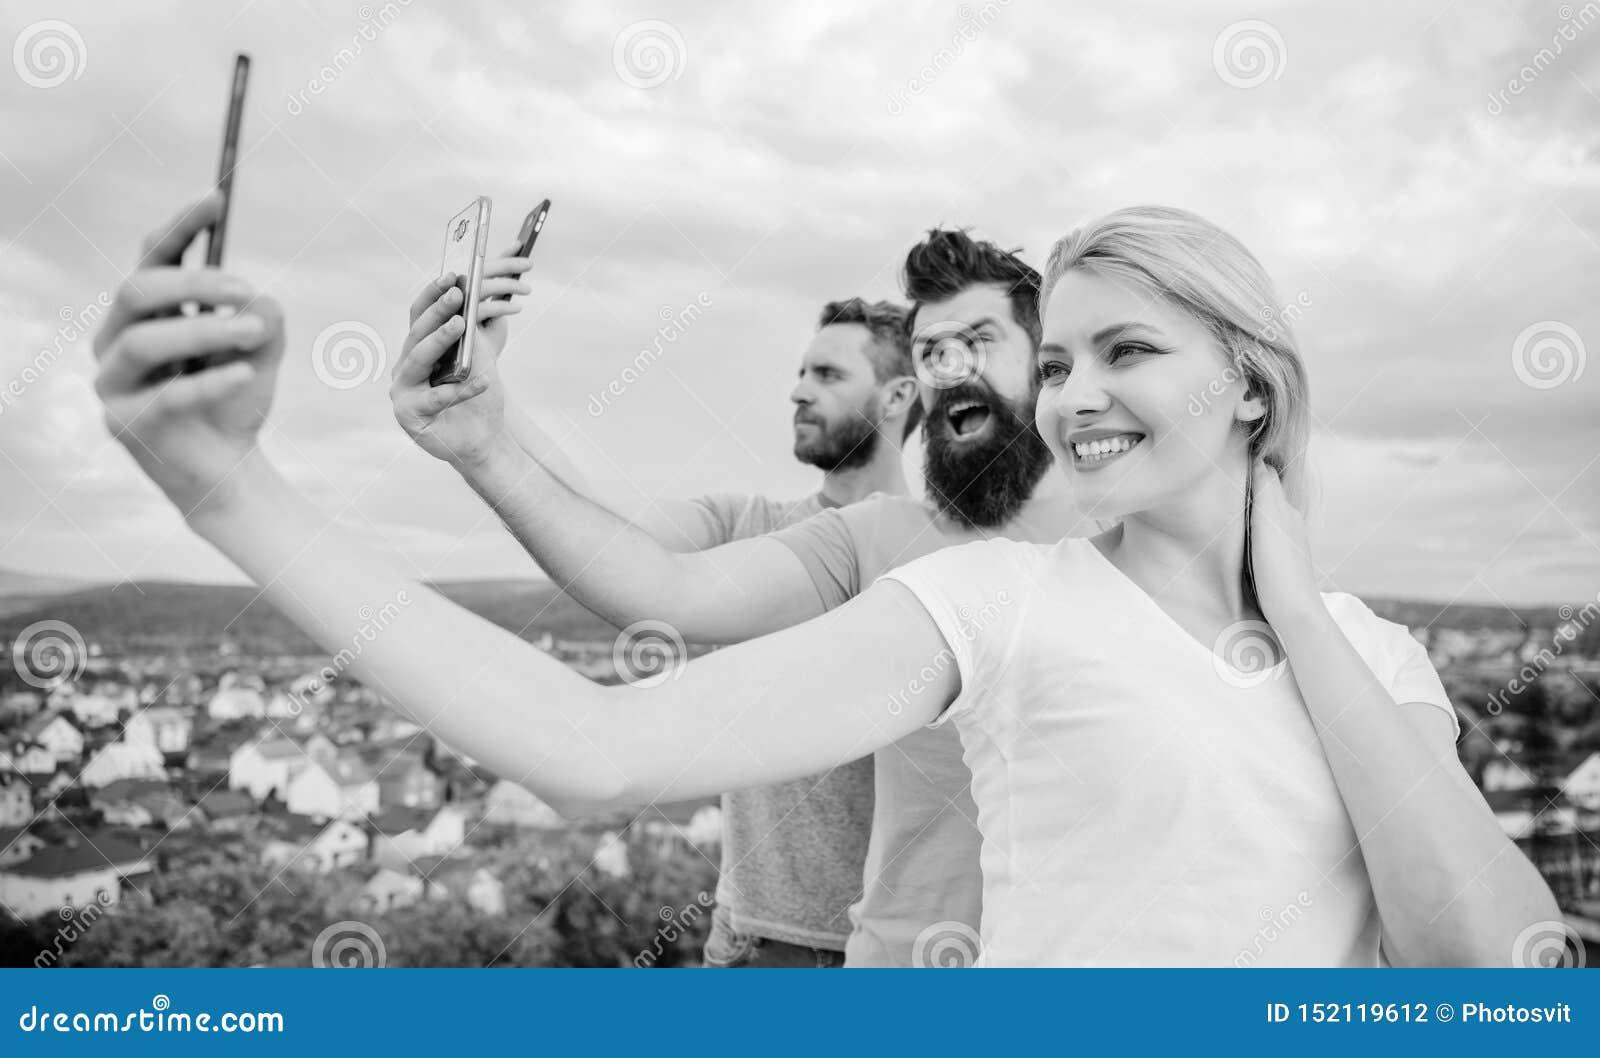 Todays selfie. Pretty woman and men holding smartphones in hands. People enjoy selfie shooting on natural landscape